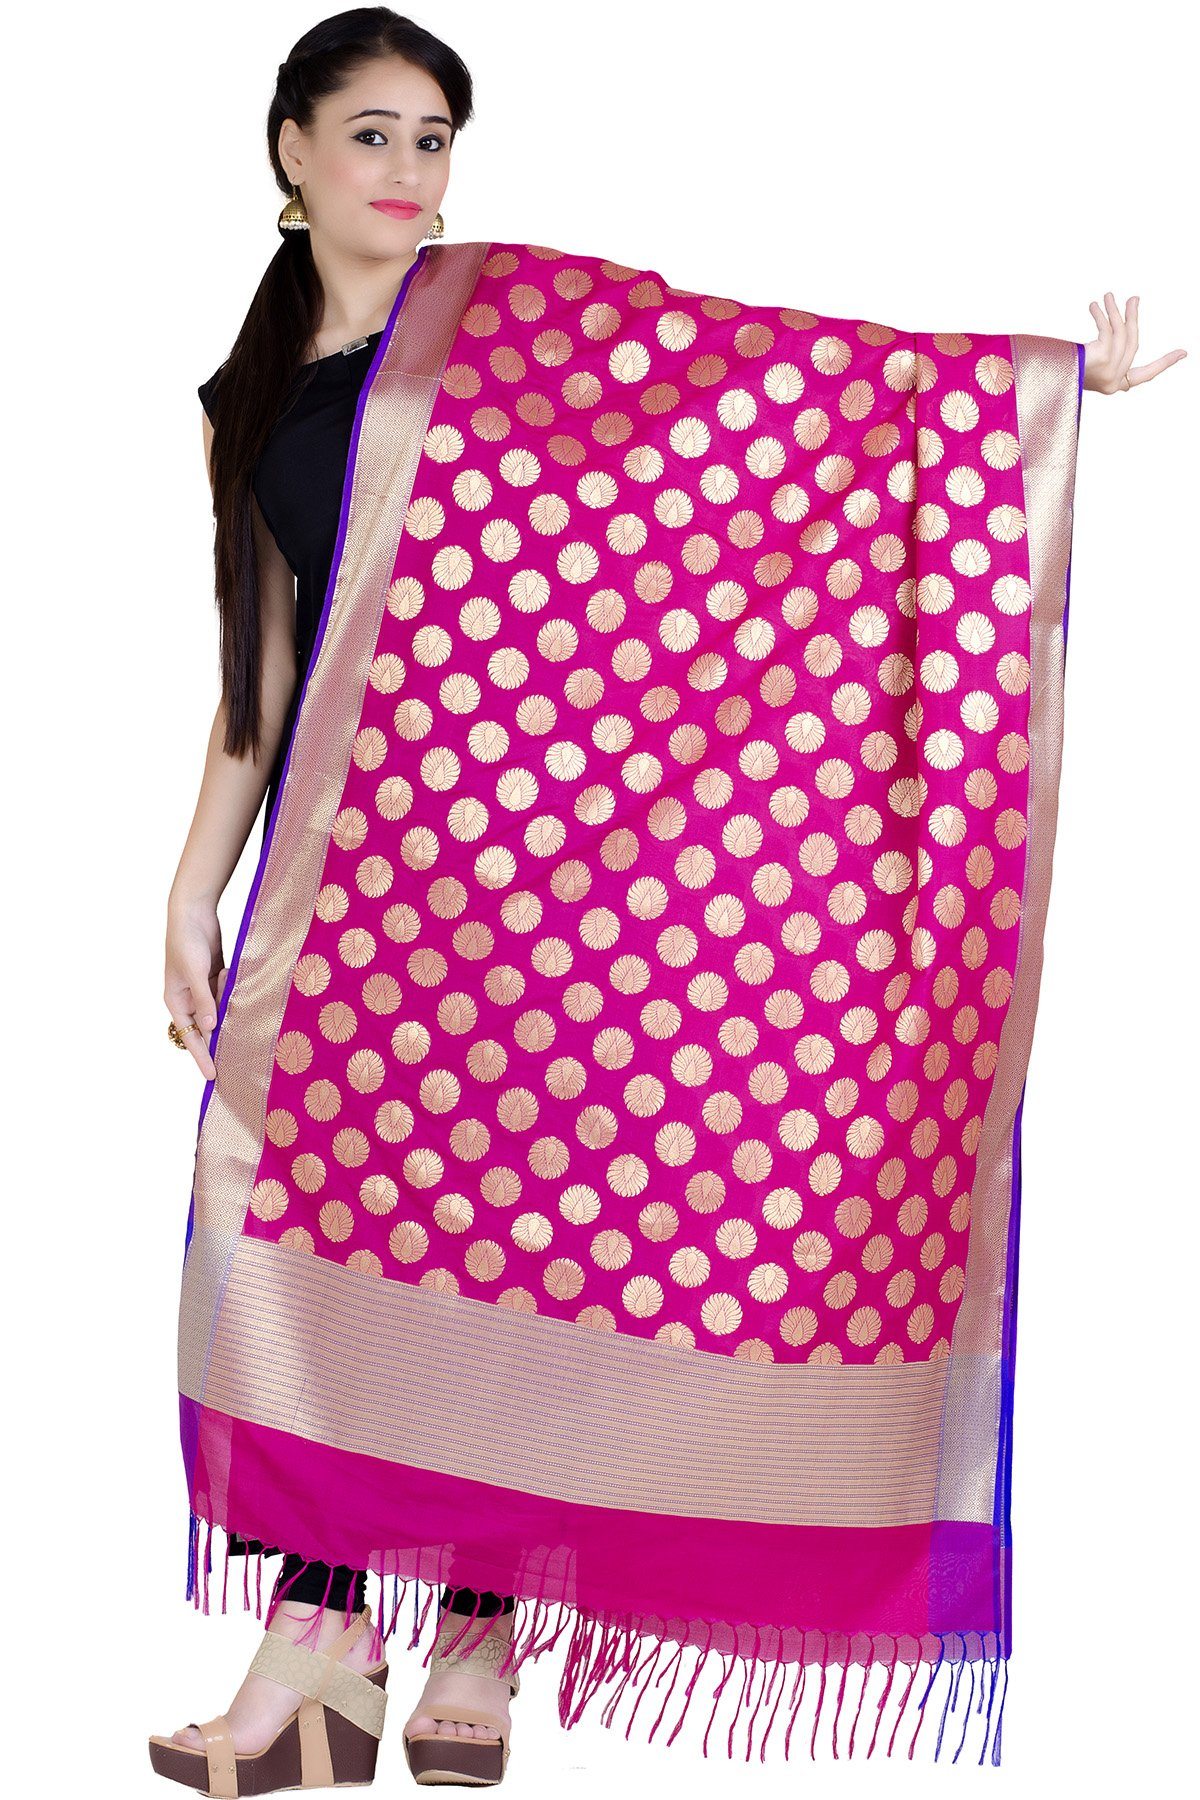 Chandrakala Women's Kataan Silk Blend Cutwork Brocade Banarasi Dupatta (Magenta) by Chandrakala (Image #1)